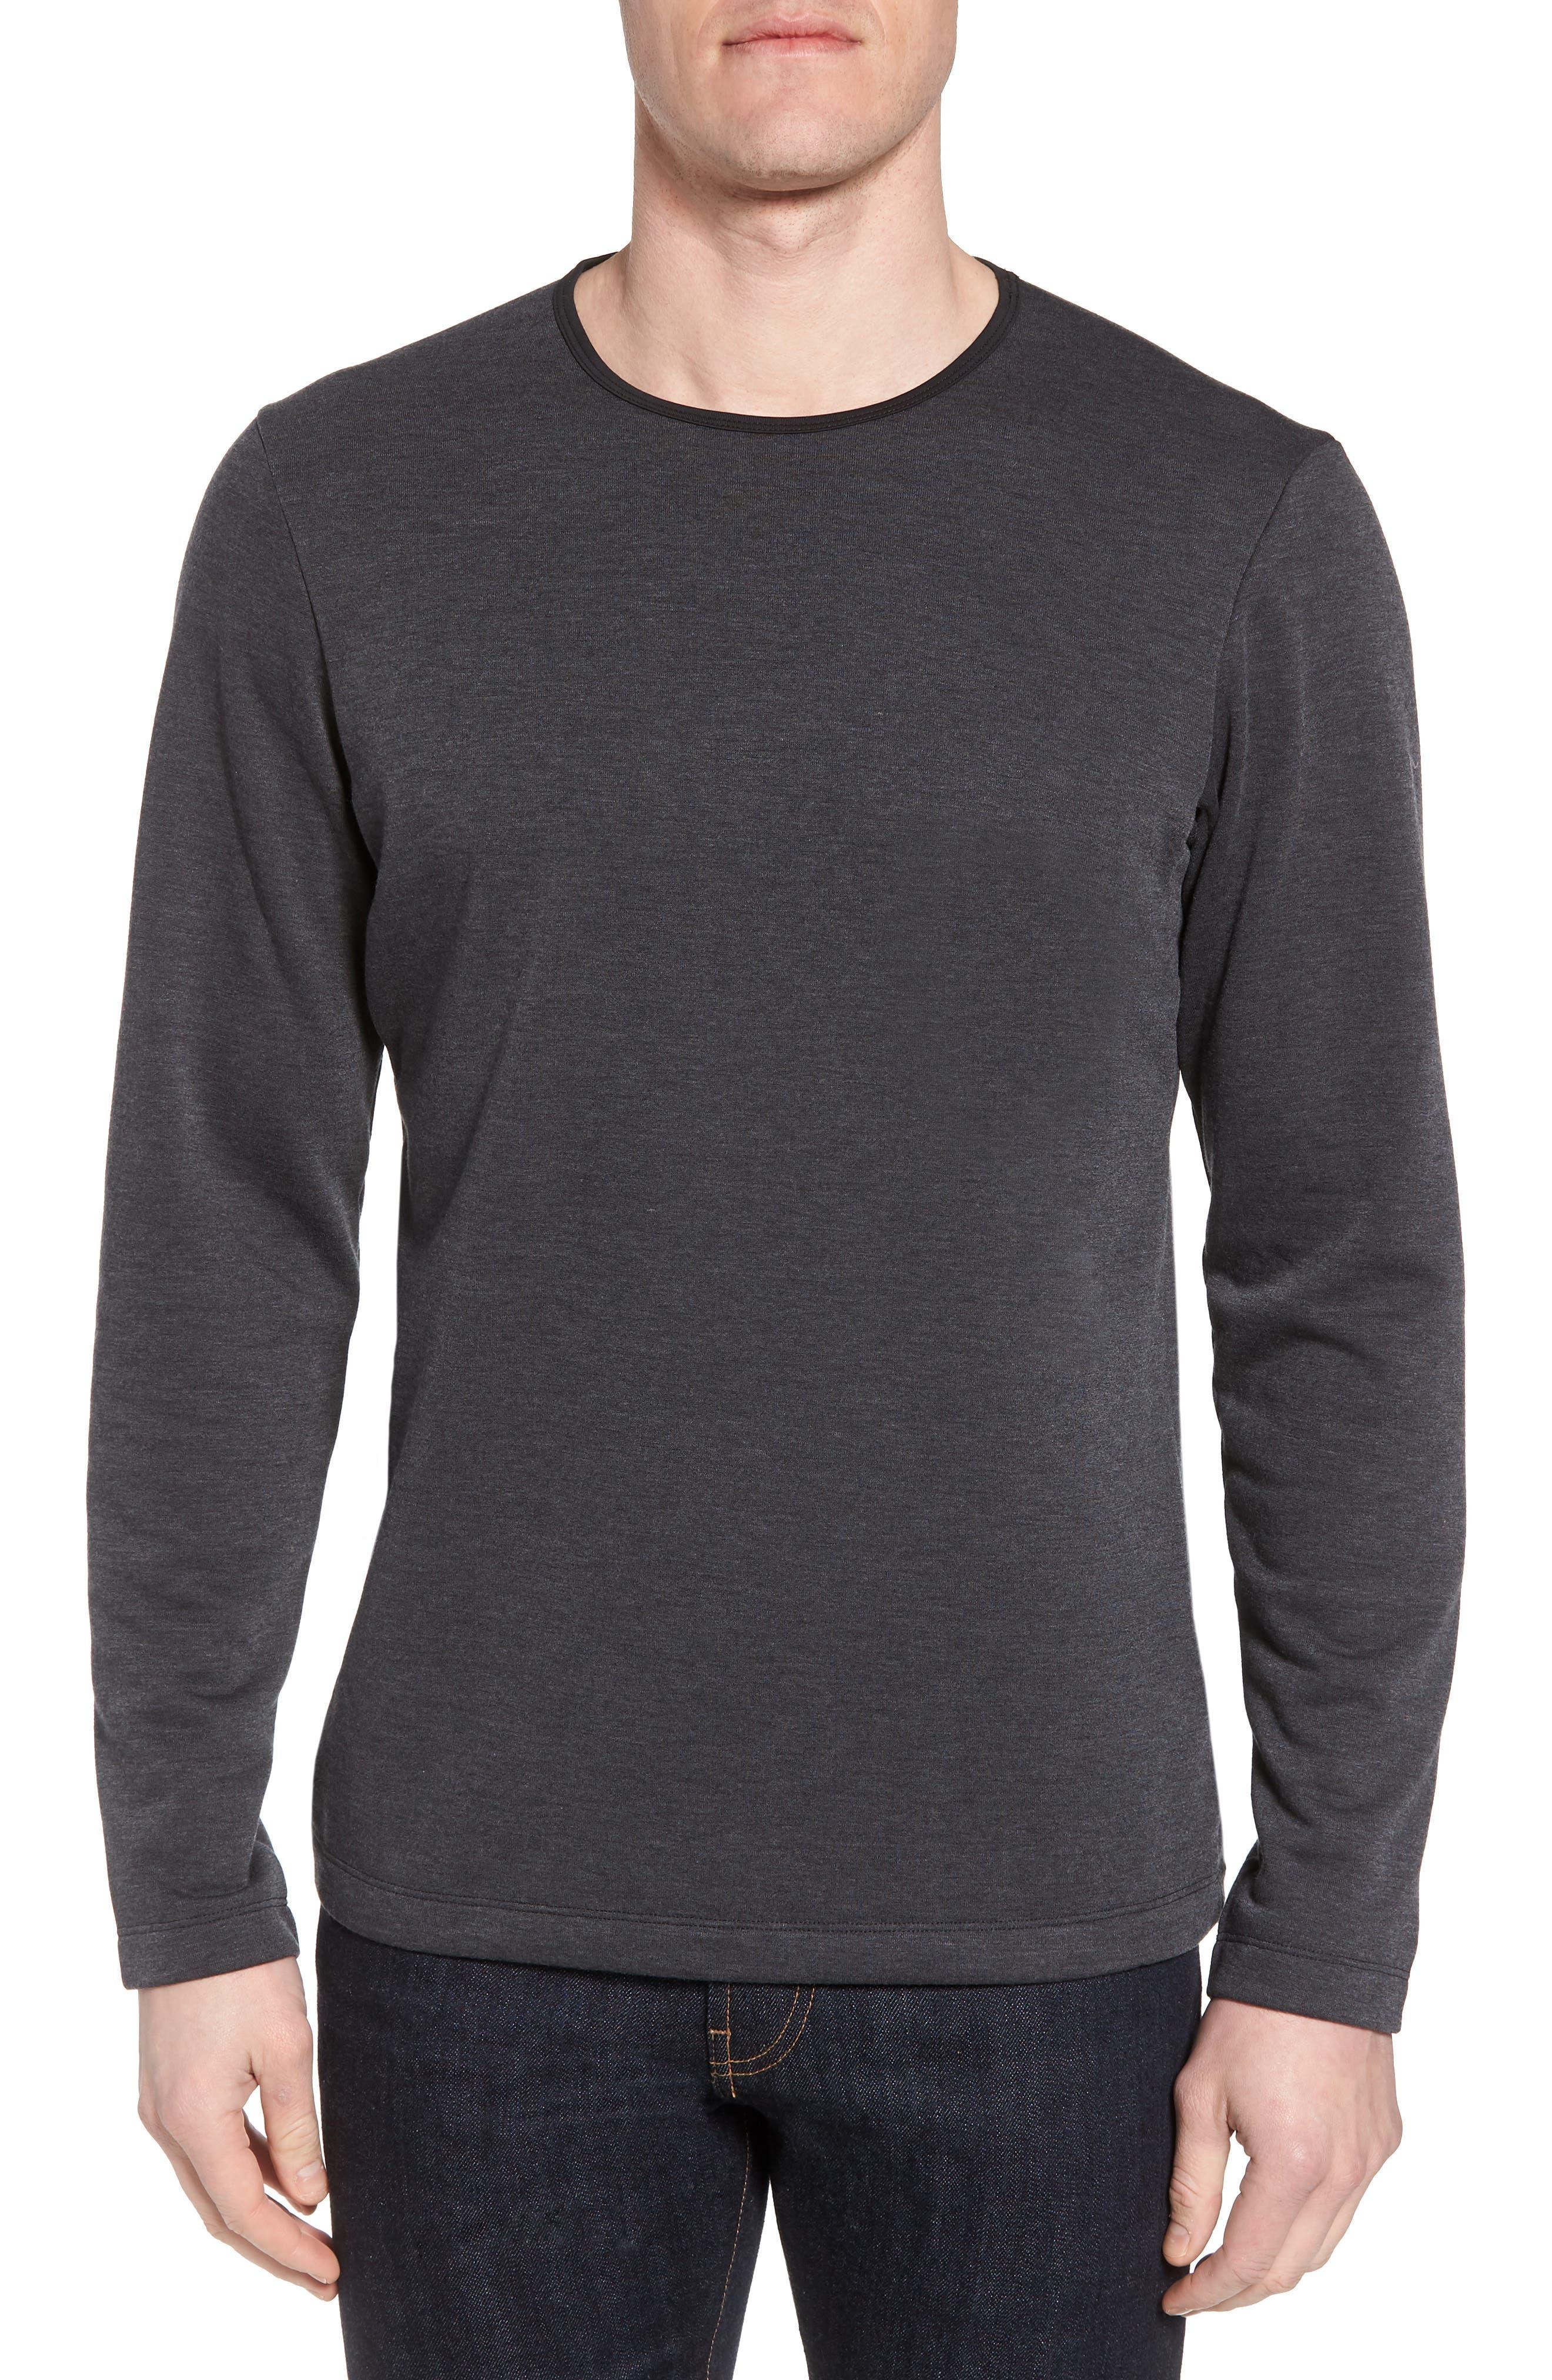 Dallen Sweatshirt,                         Main,                         color, Pilot